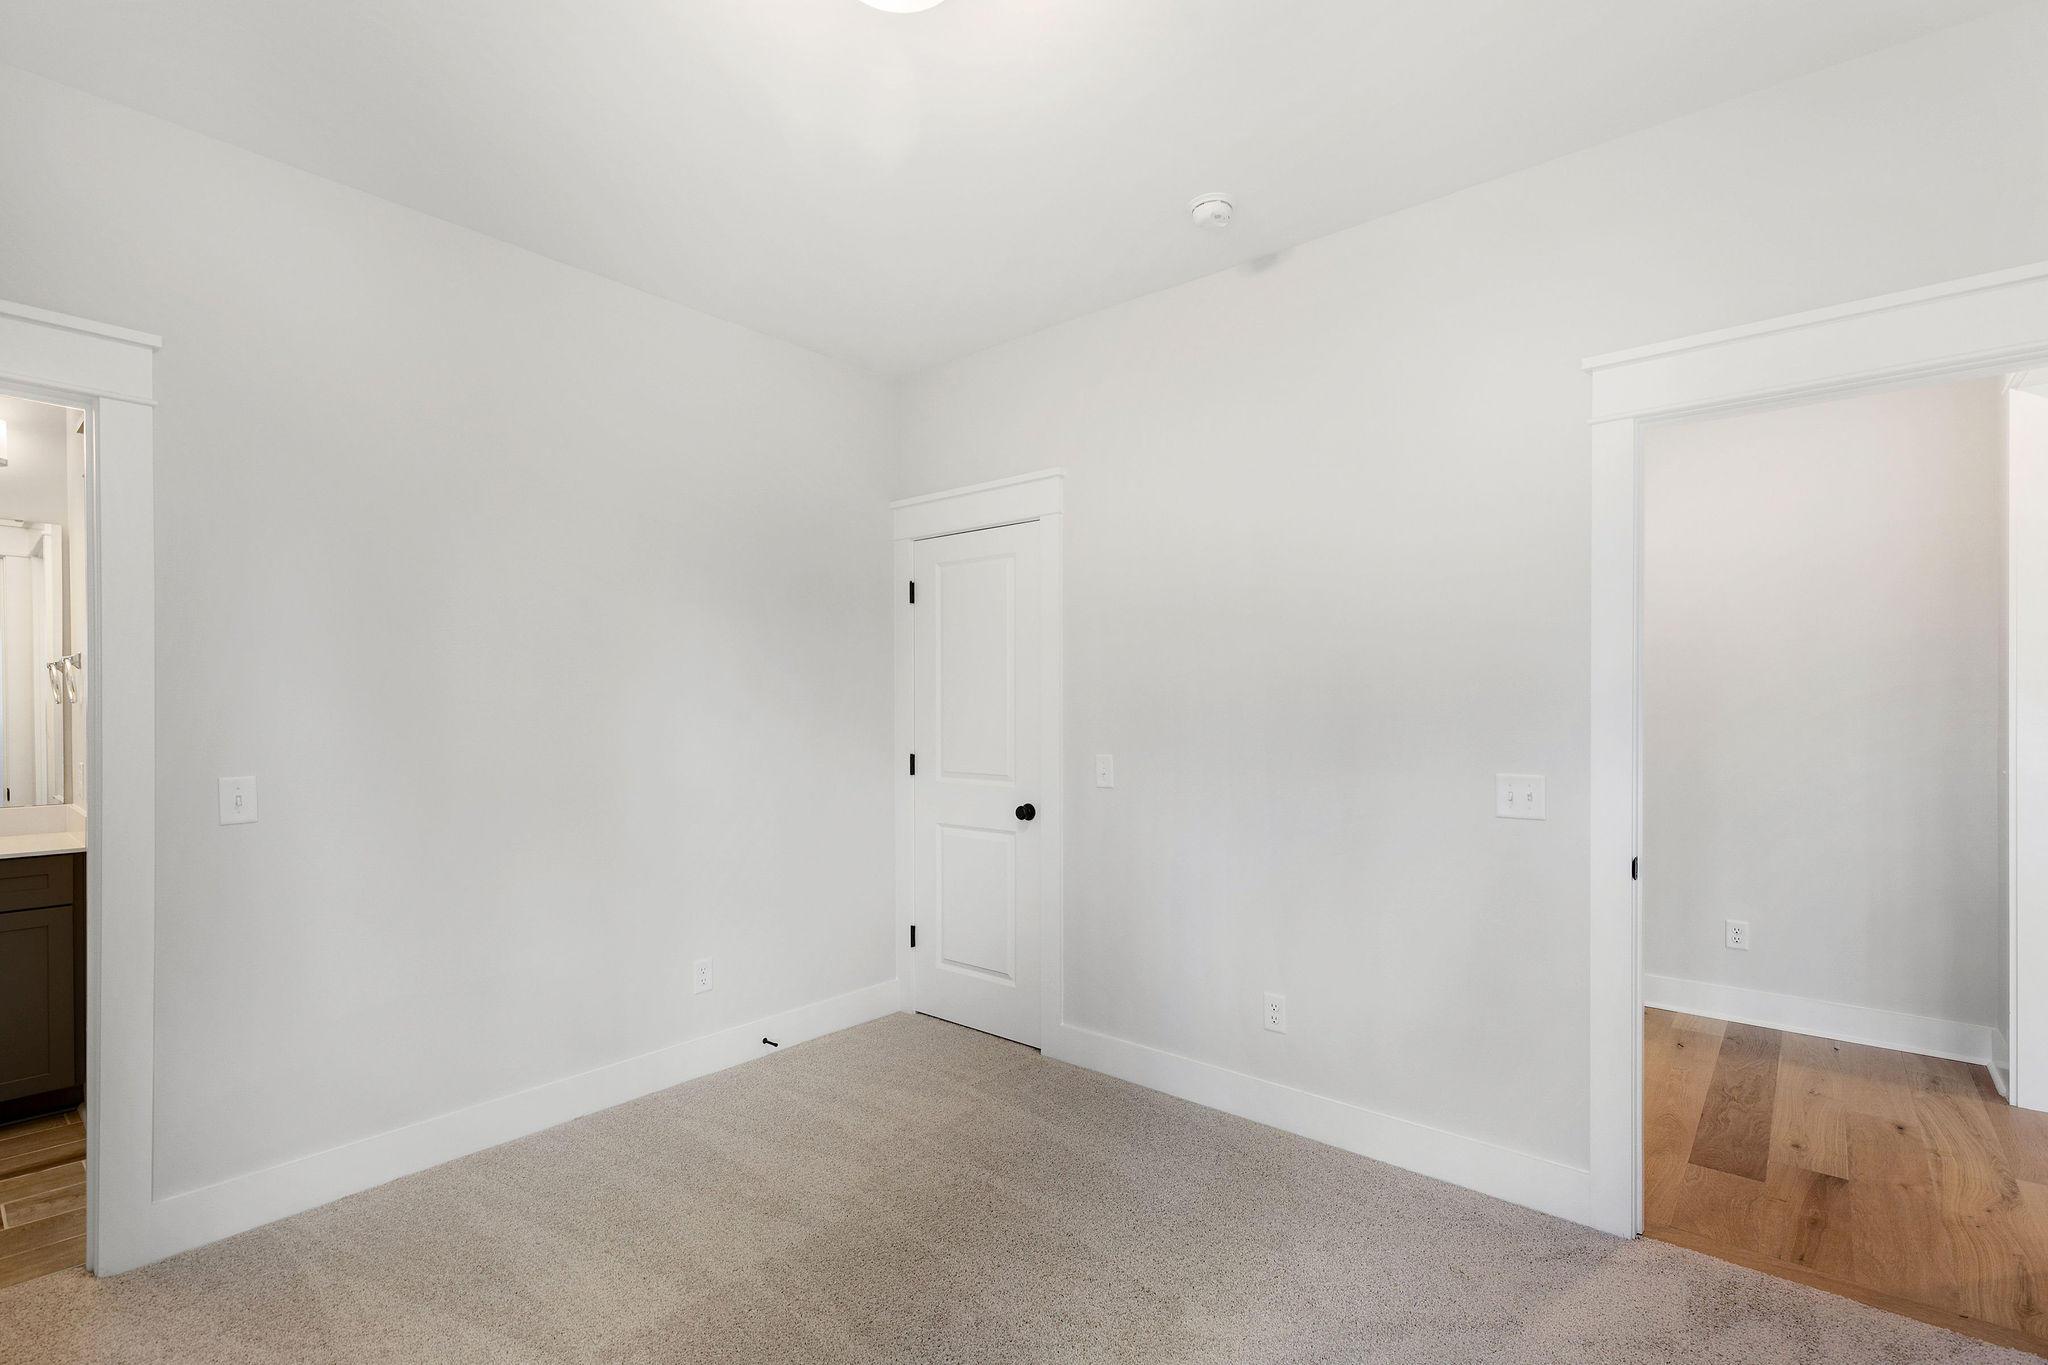 Park West Homes For Sale - 2291 Middlesex, Mount Pleasant, SC - 22